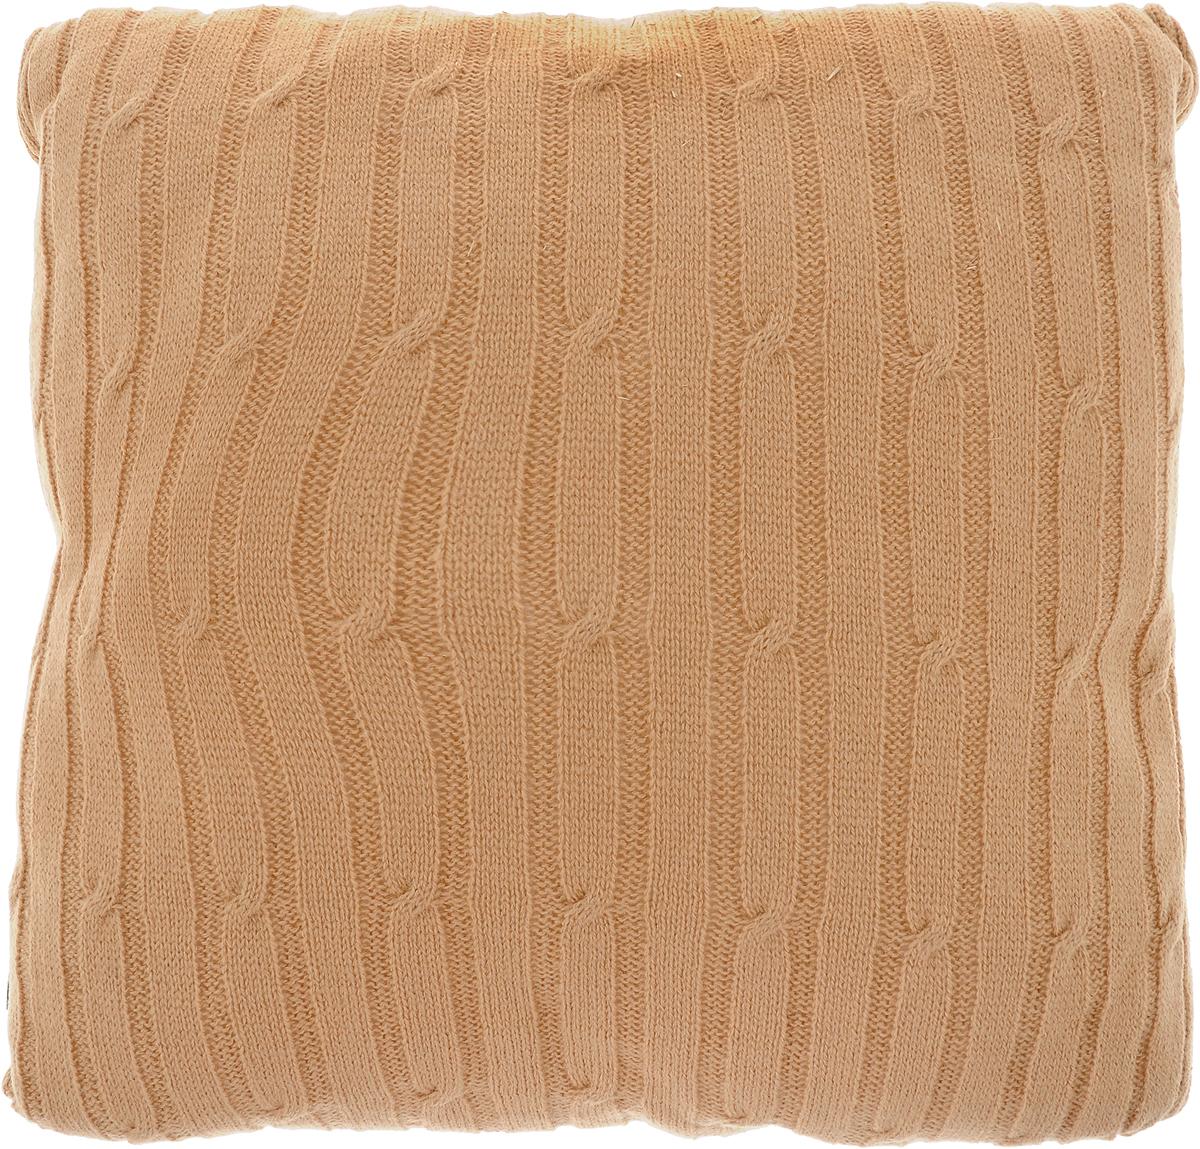 Подушка декоративная Proffi Home Косы, цвет: светло-коричневый, 40 х 40 см часы настенные proffi home корица